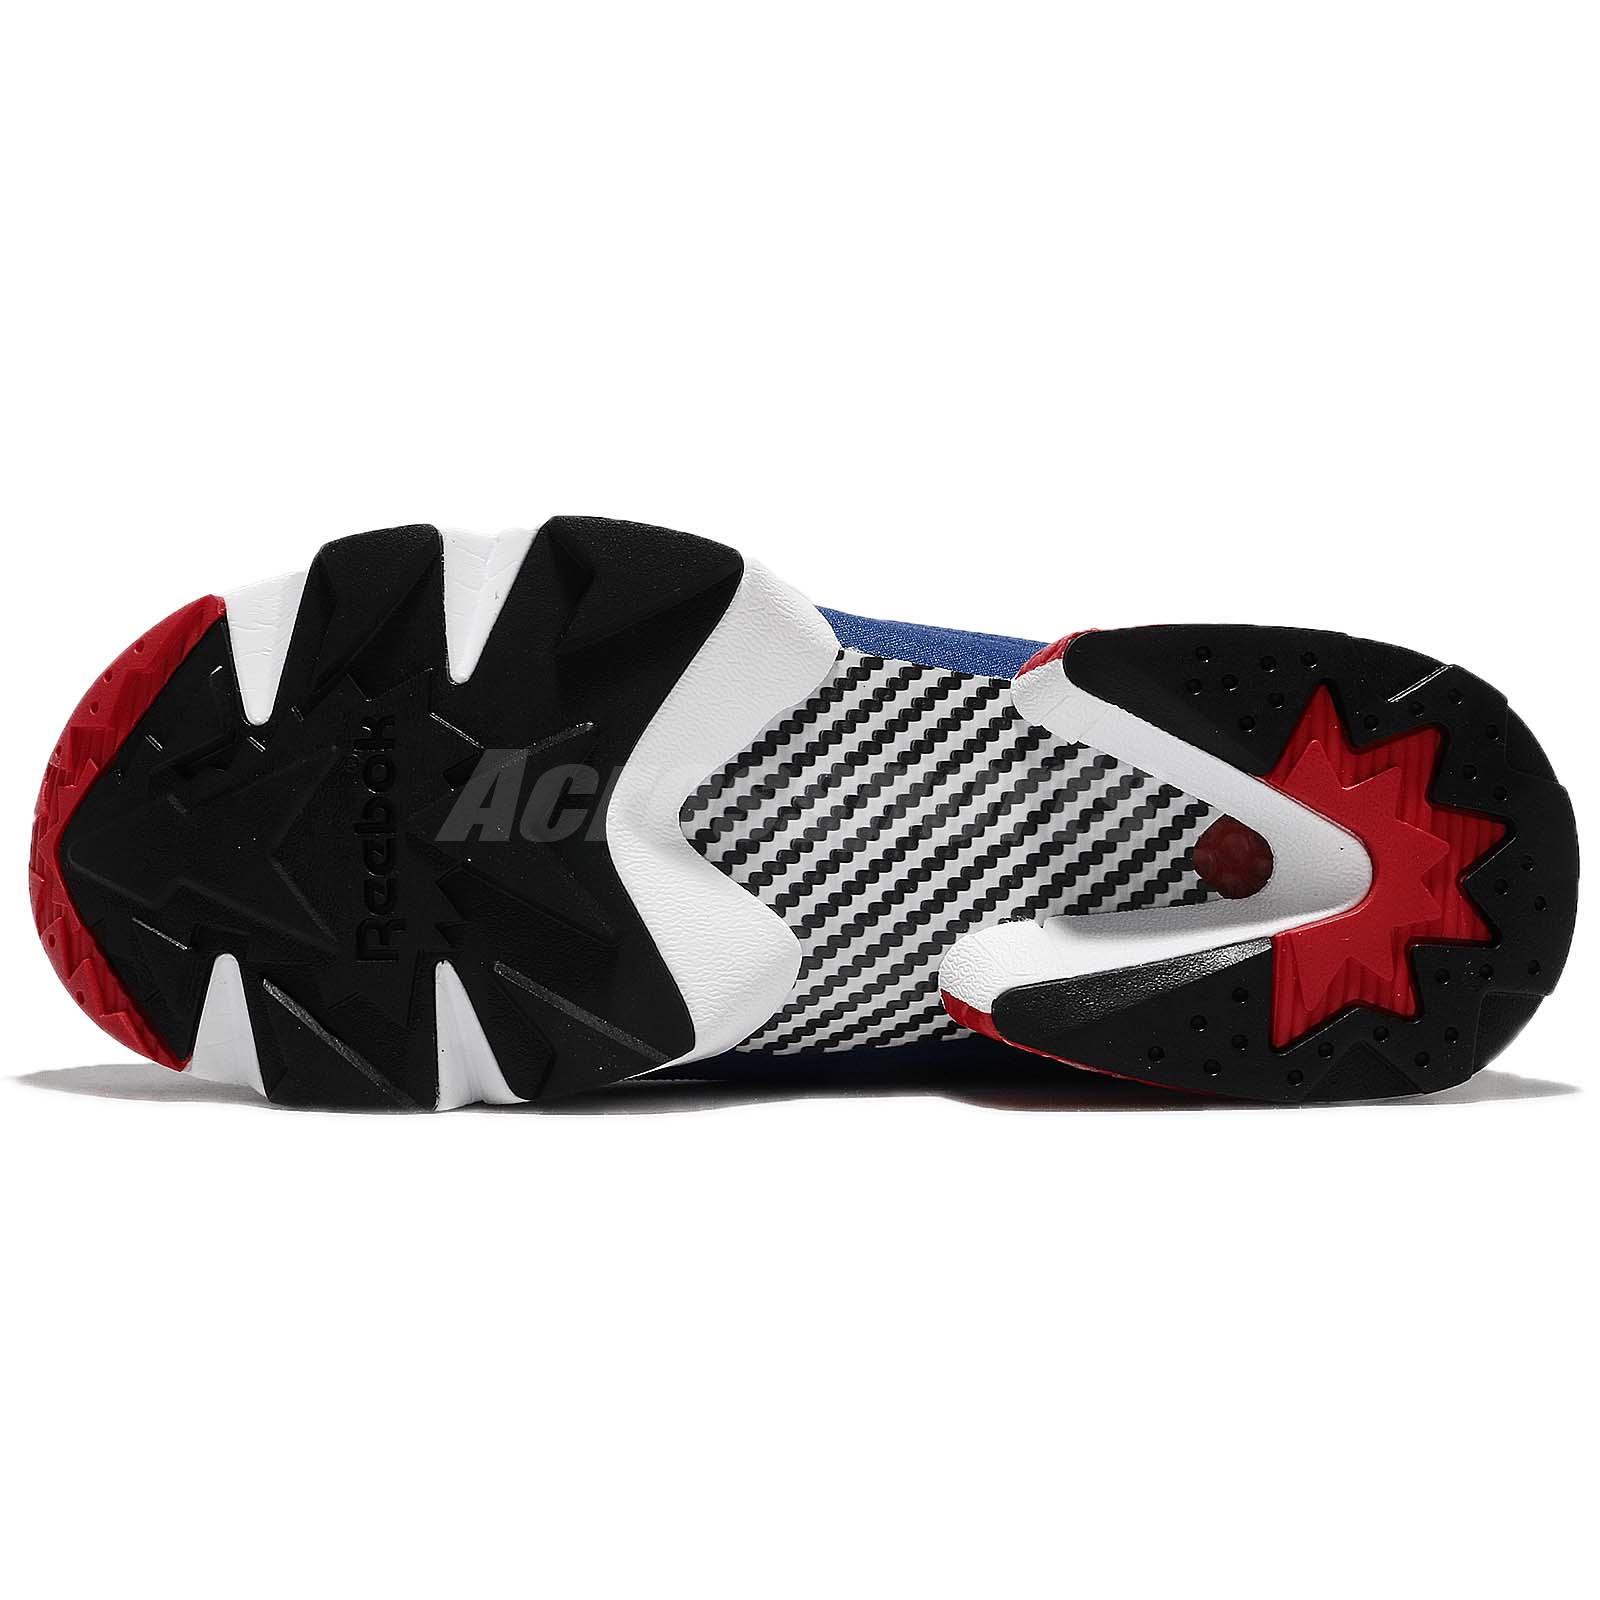 f3a4f3f764ad ... coupon for details about reebok instapump fury og ultk ultraknit black  blue red men running shoes